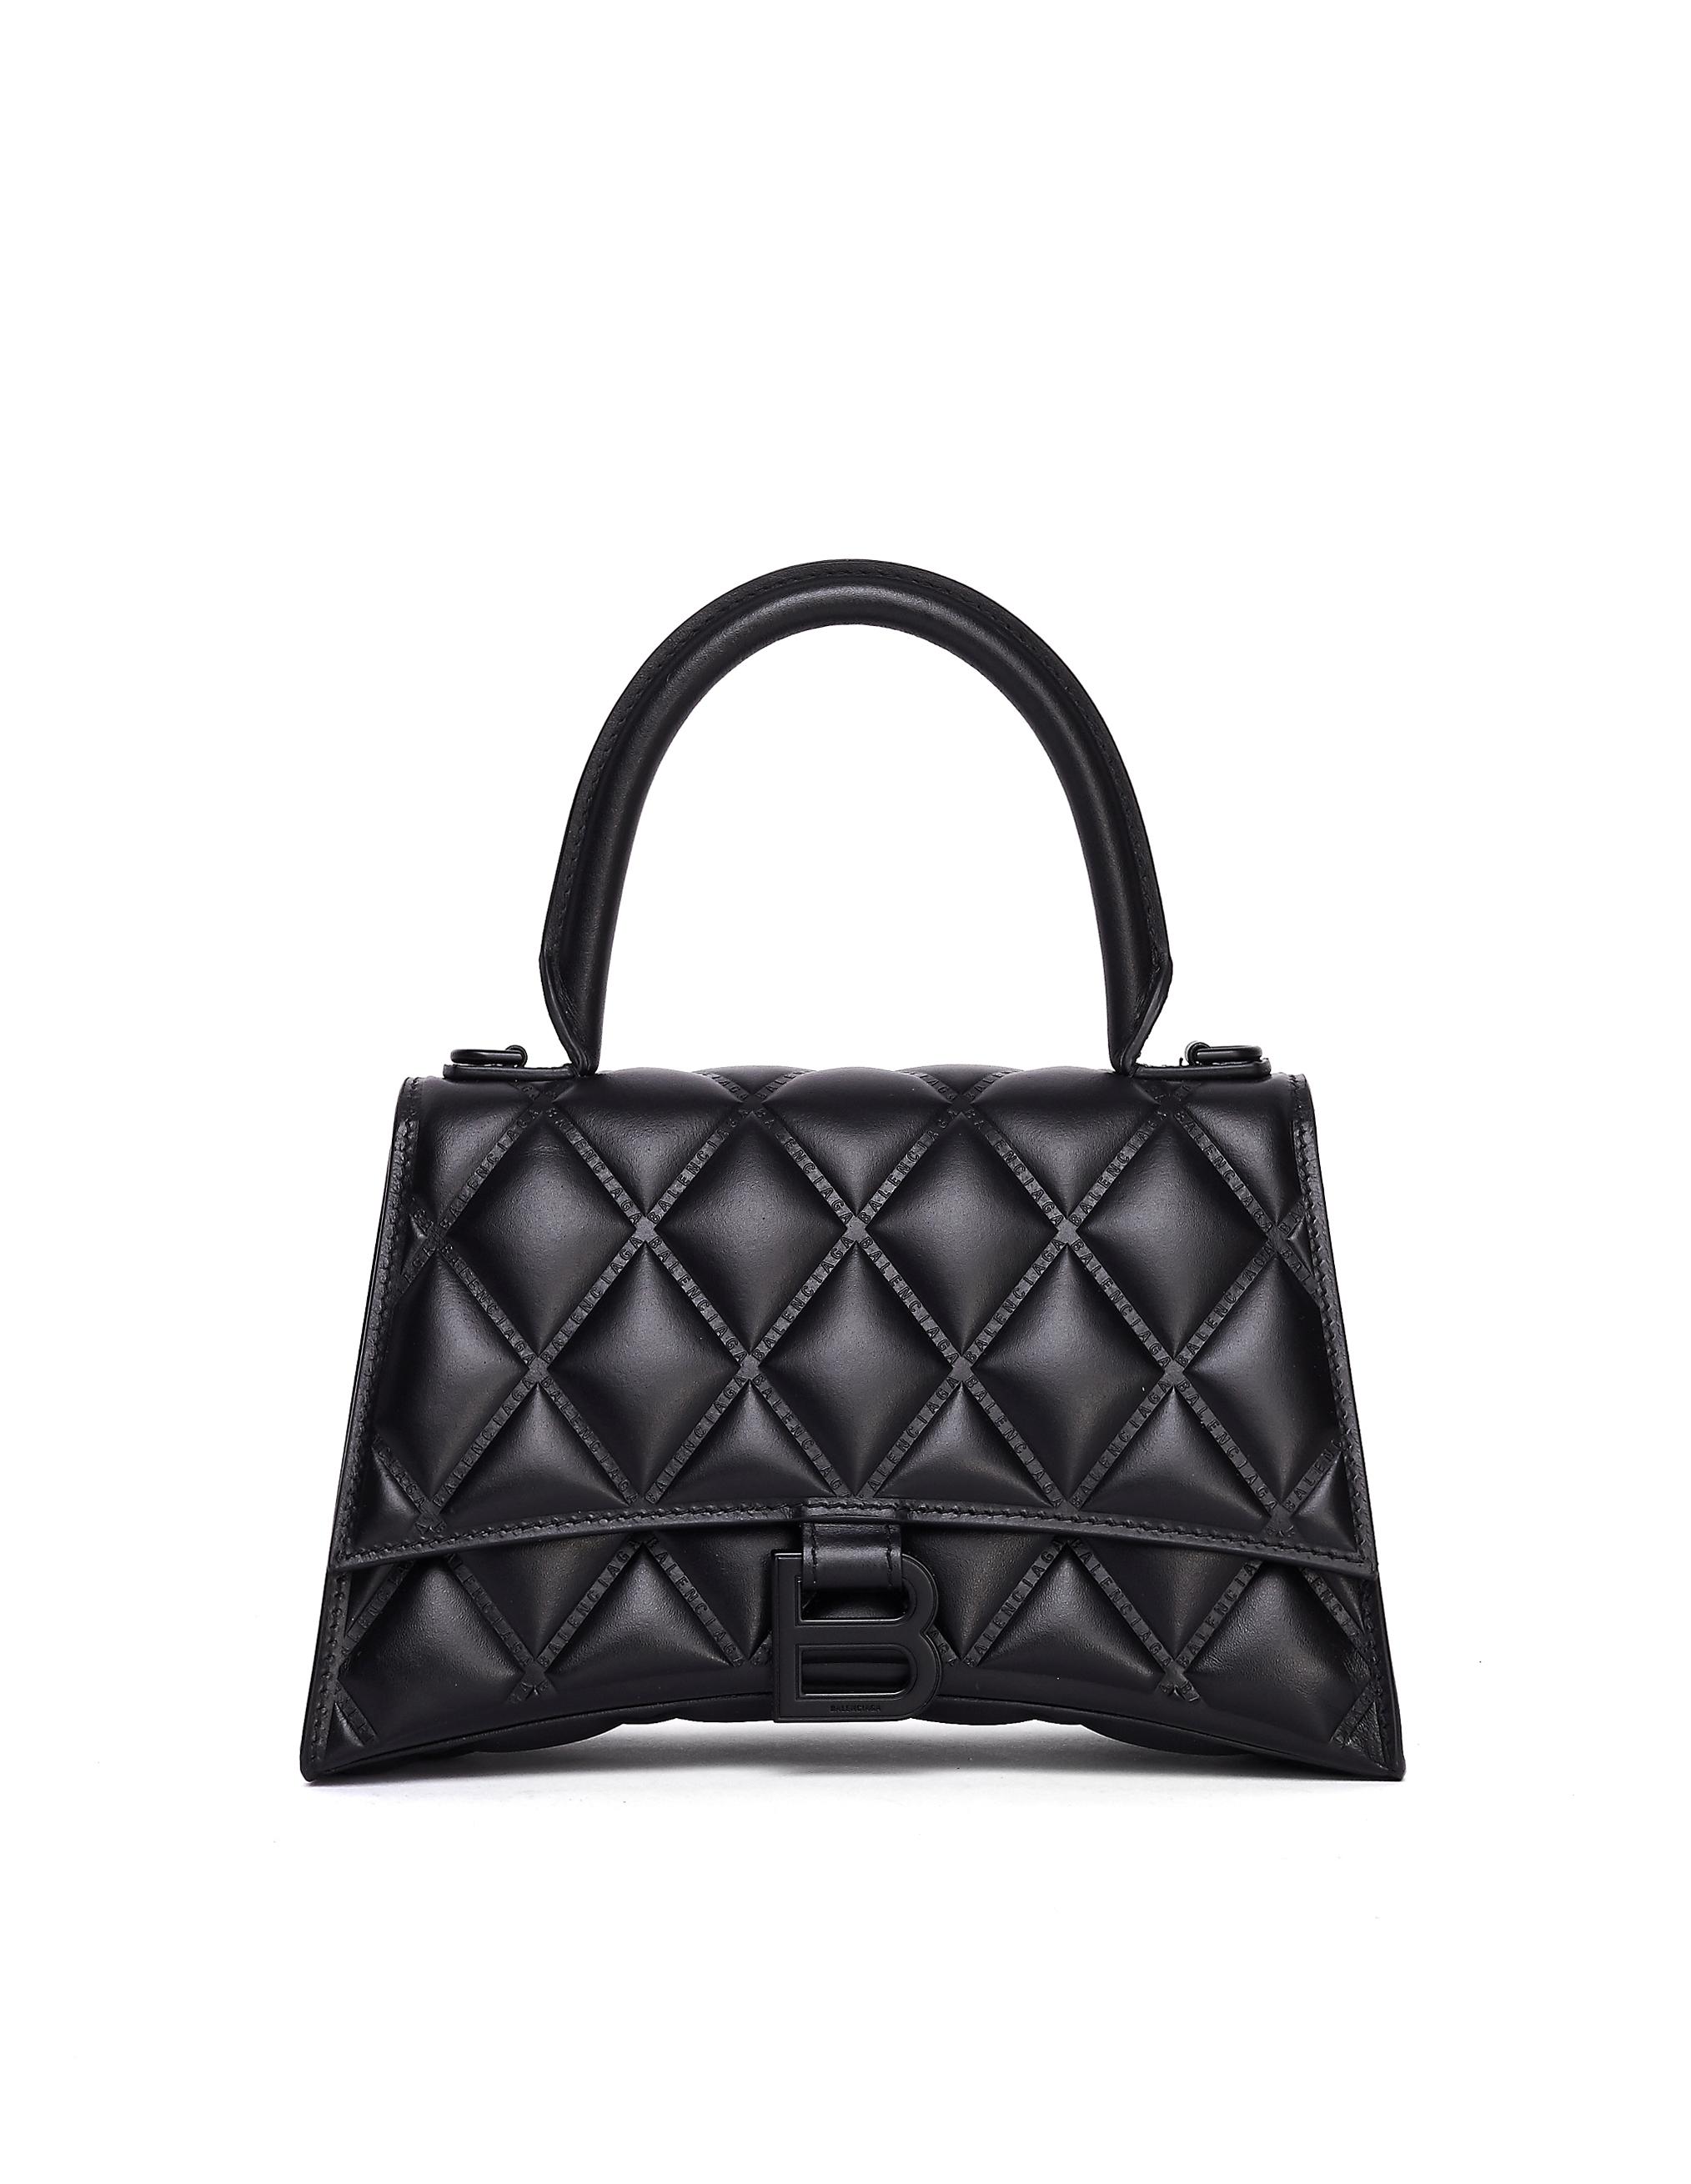 Balenciaga Black Hourglass Top Handle Bag